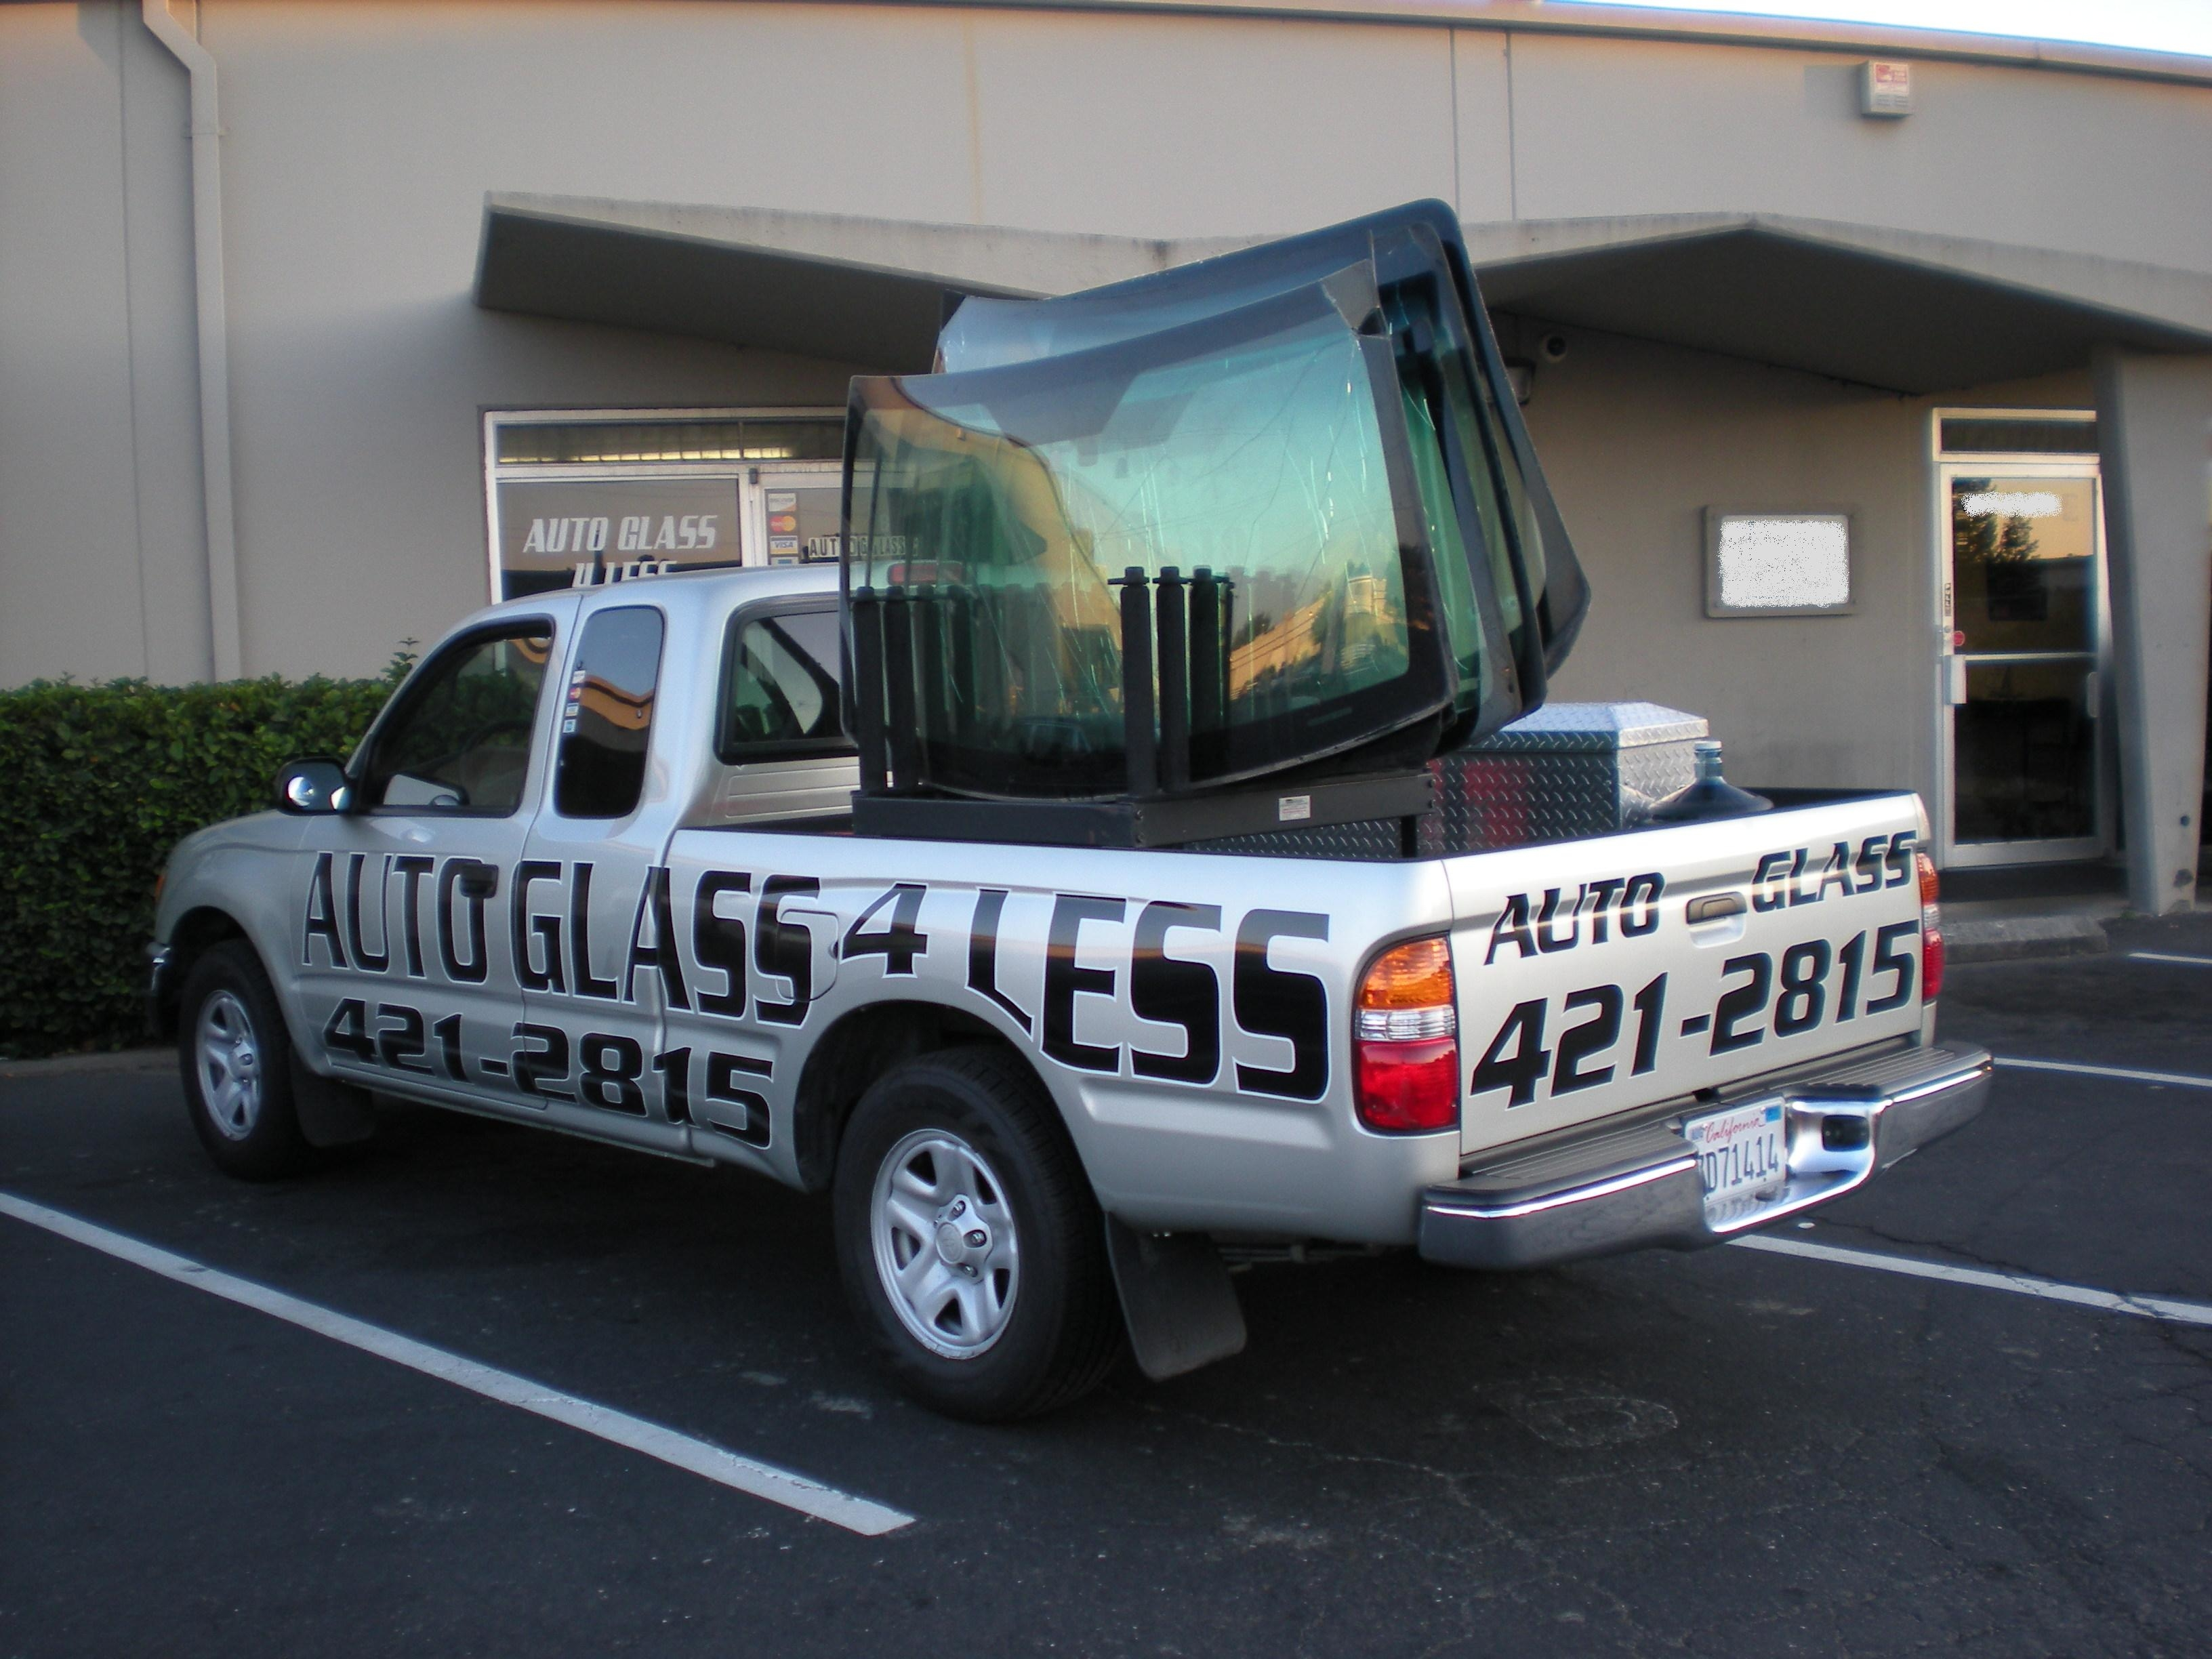 Auto Glass 4 Less 5711 Florin Perkins Road Sacramento, CA Auto Glass ...